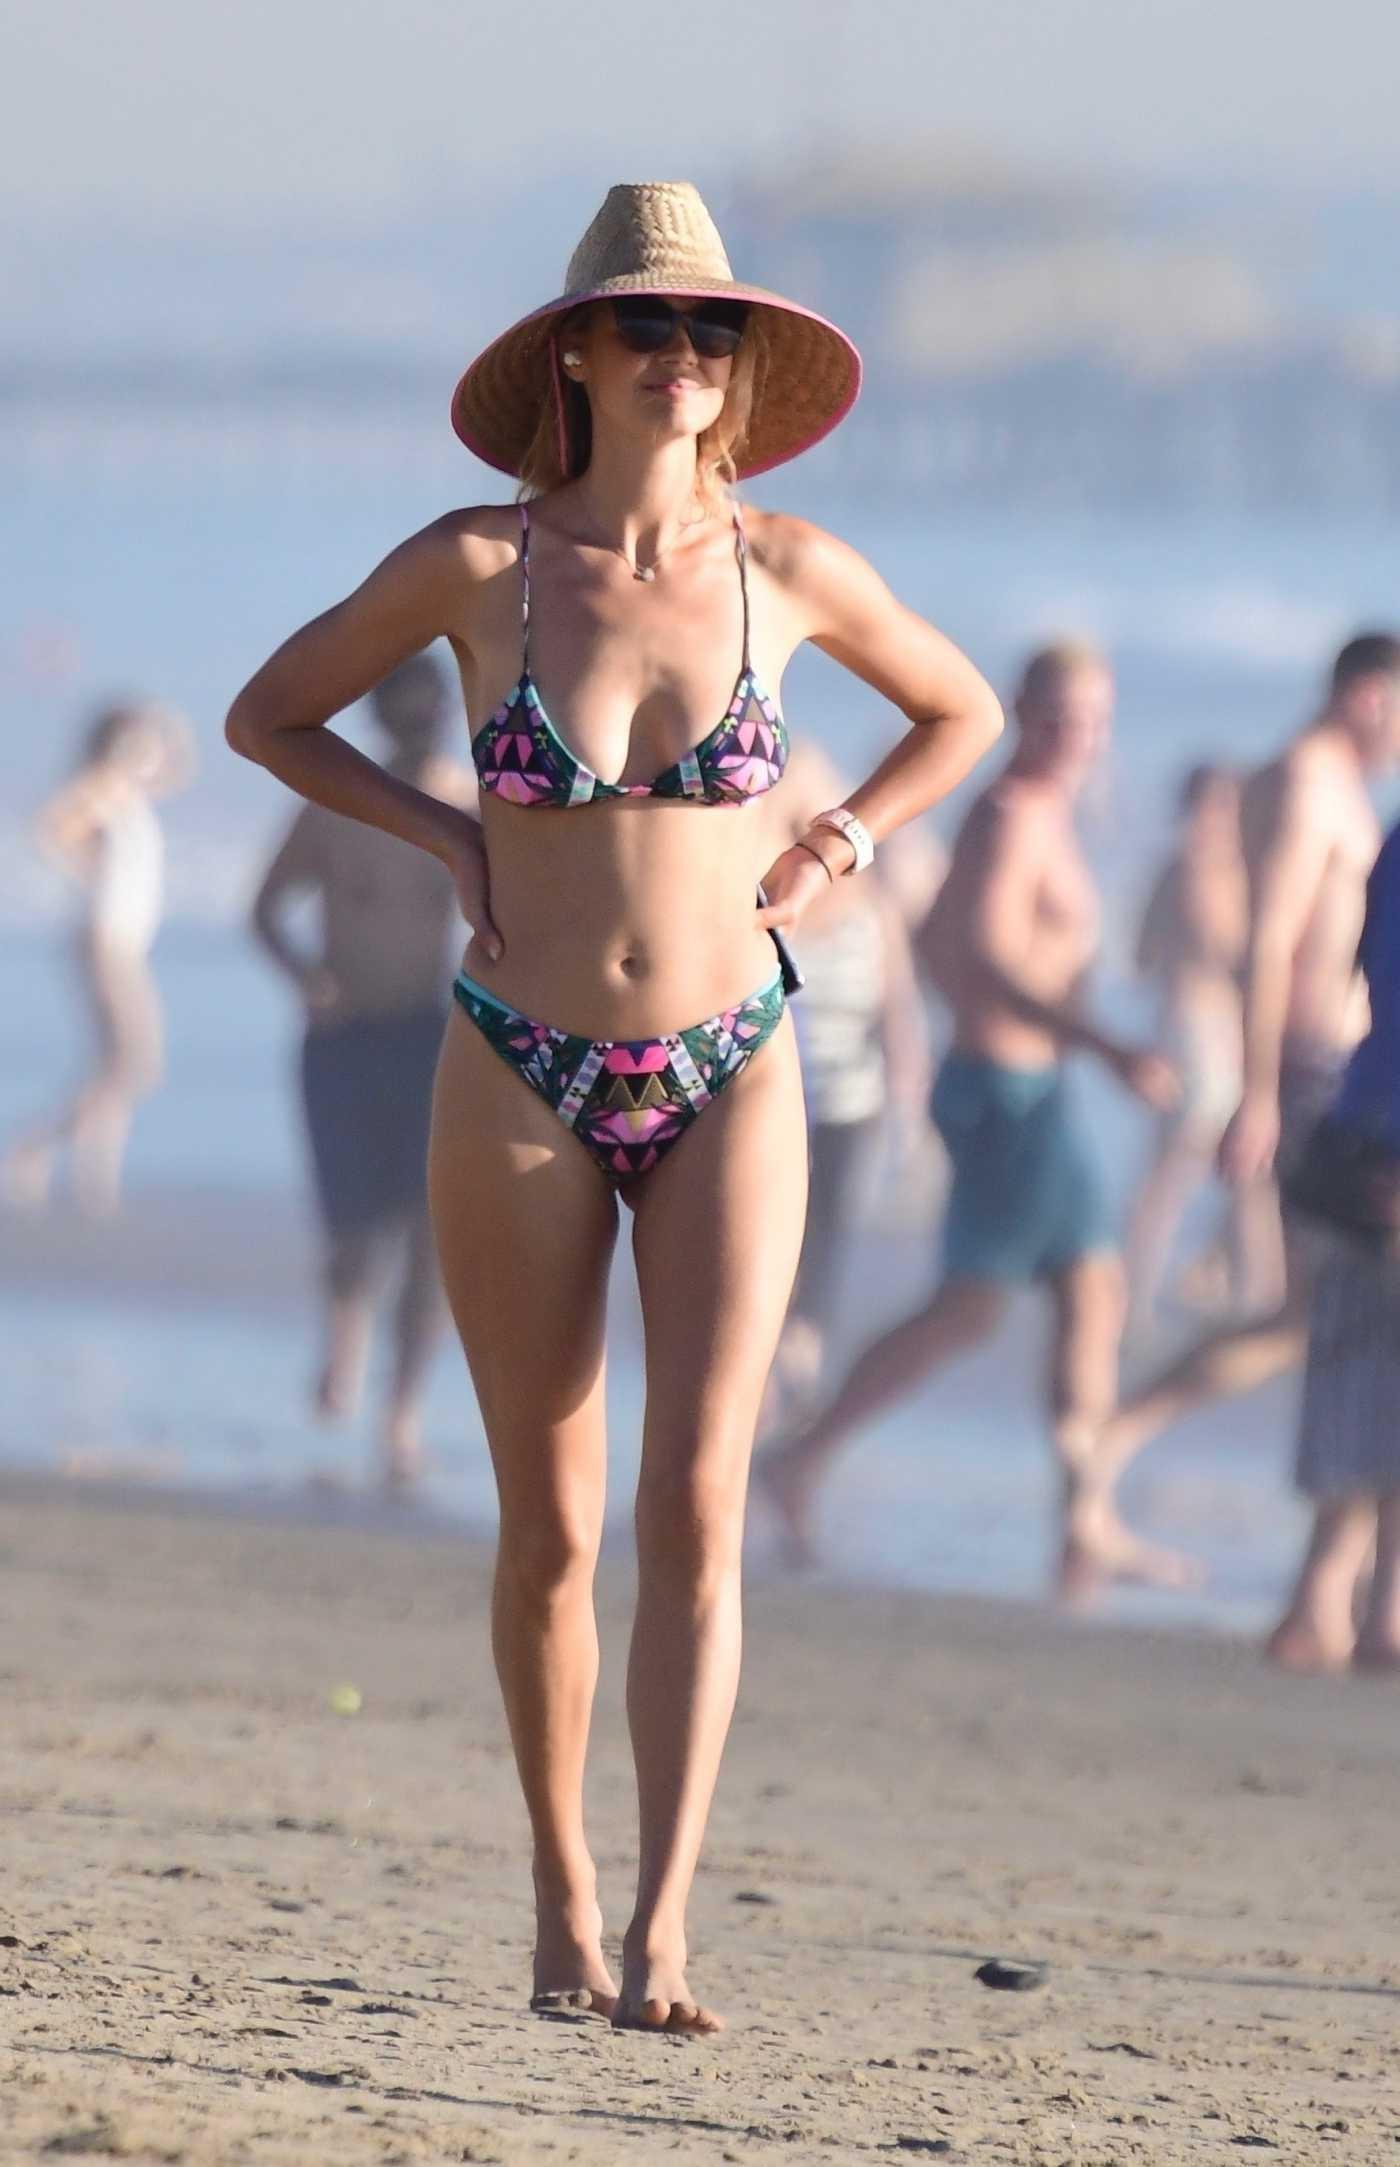 Kelly Rohrbach in a Colorful Bikini on the Beach in Santa Monica 01/17/2021